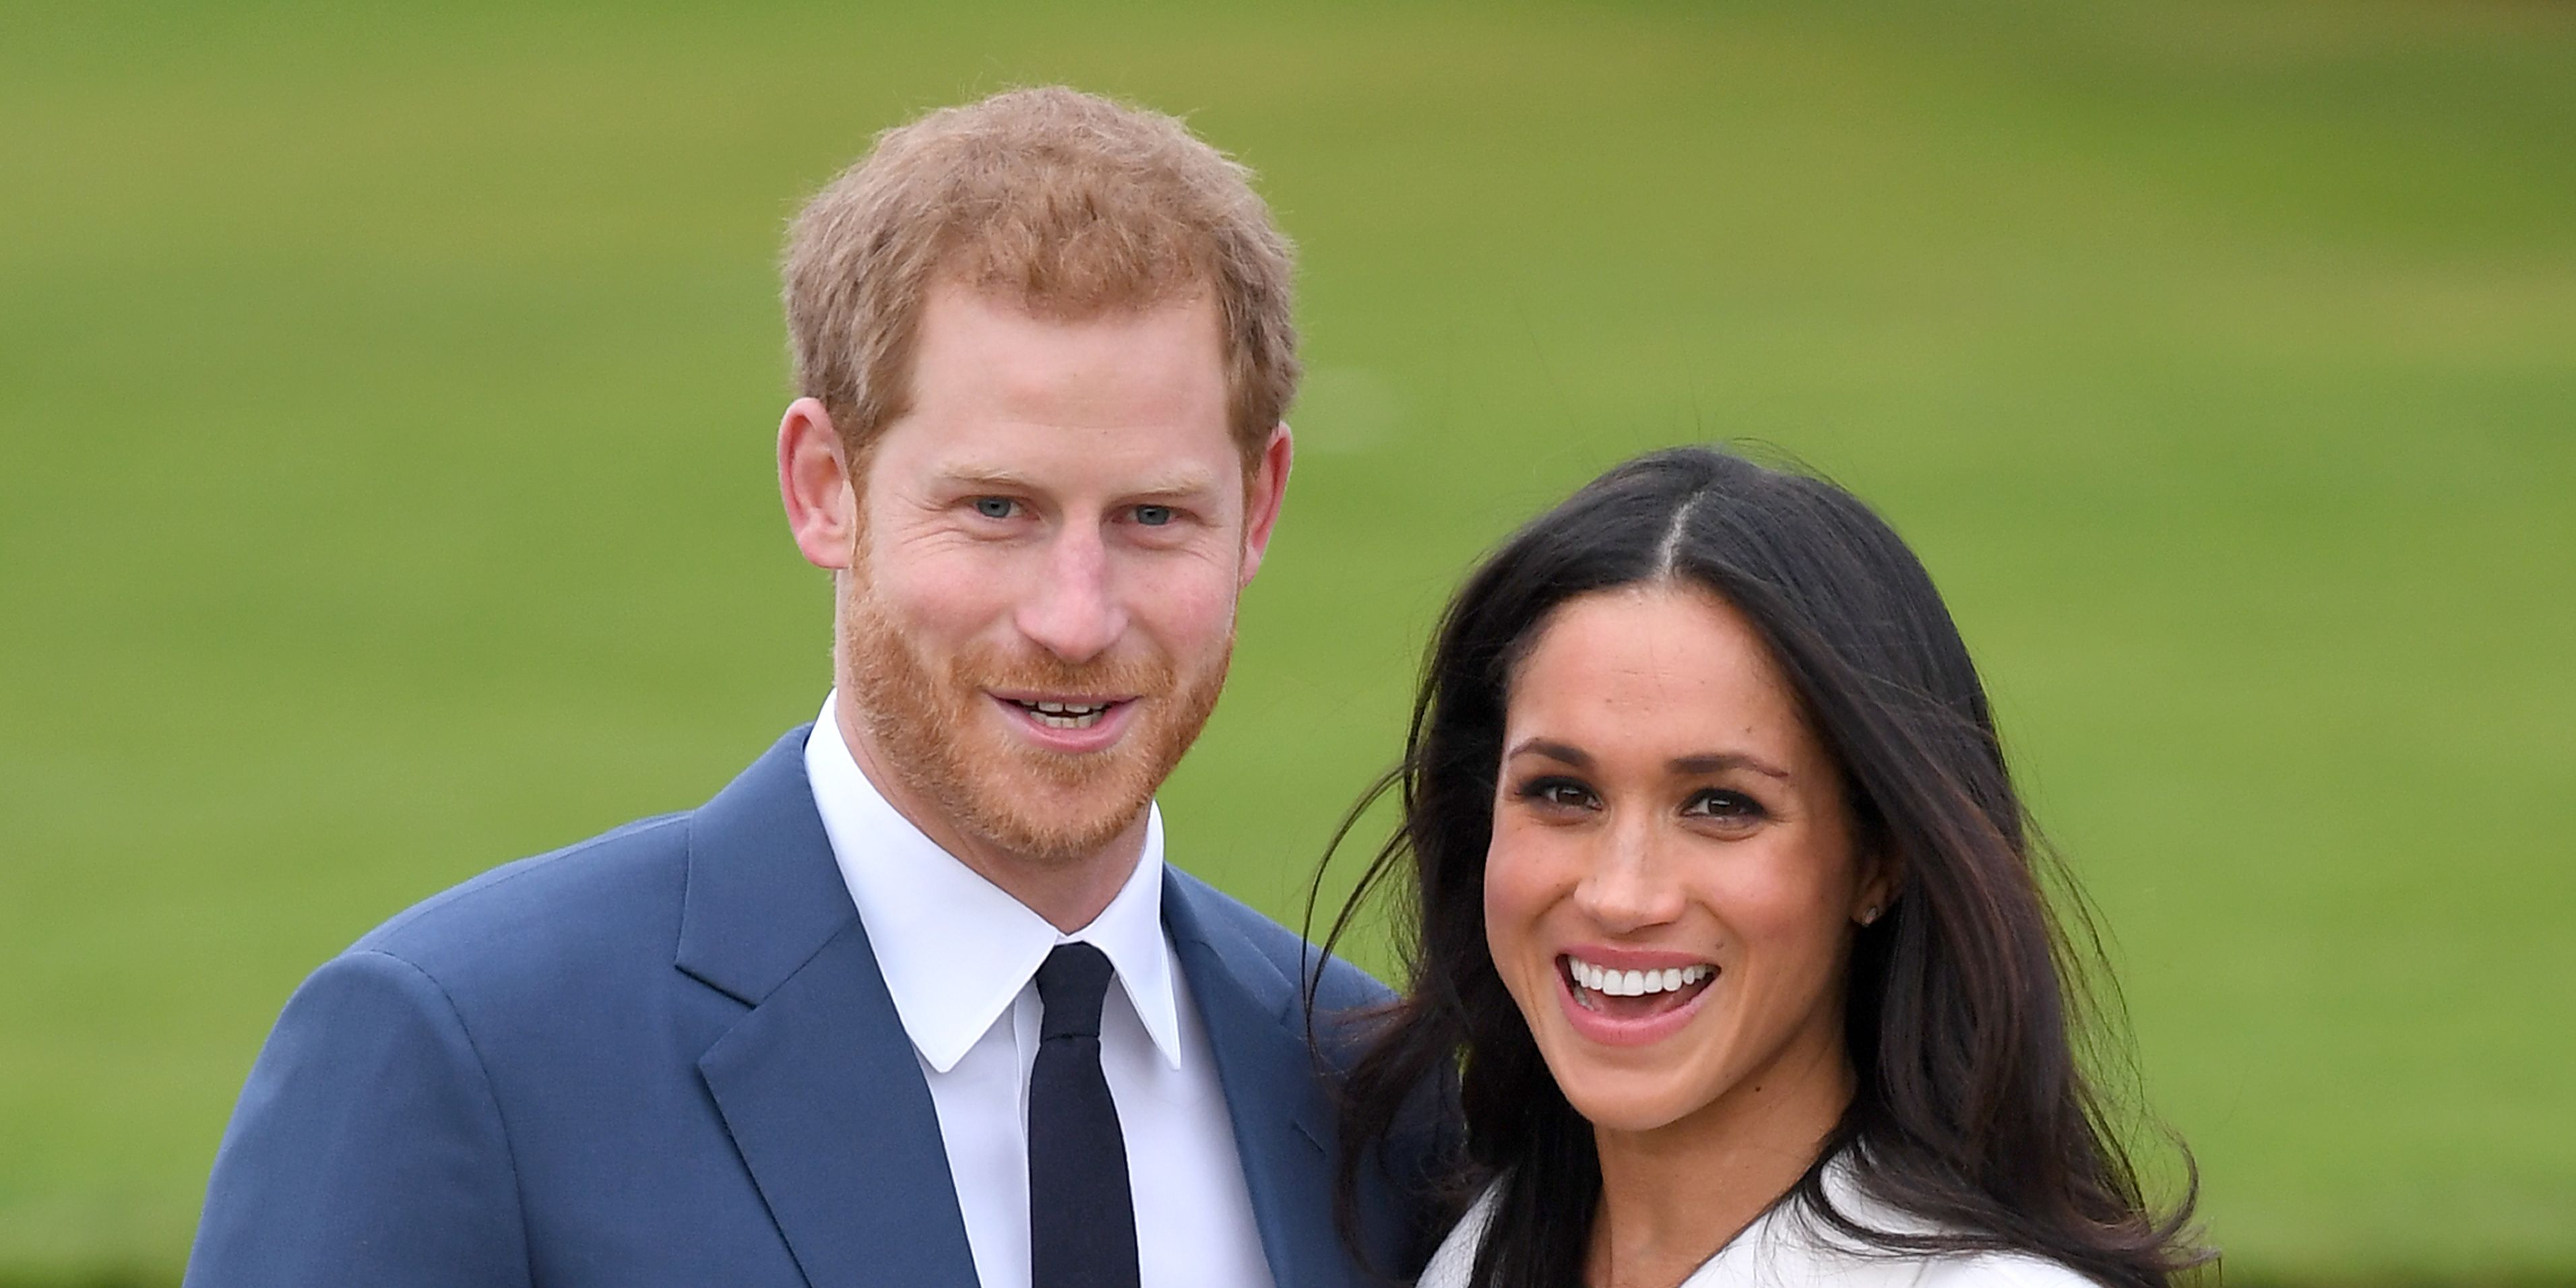 Meghan Markle en Prins Harry verhuizen naar Frogmore House, hier in Kensington Palace